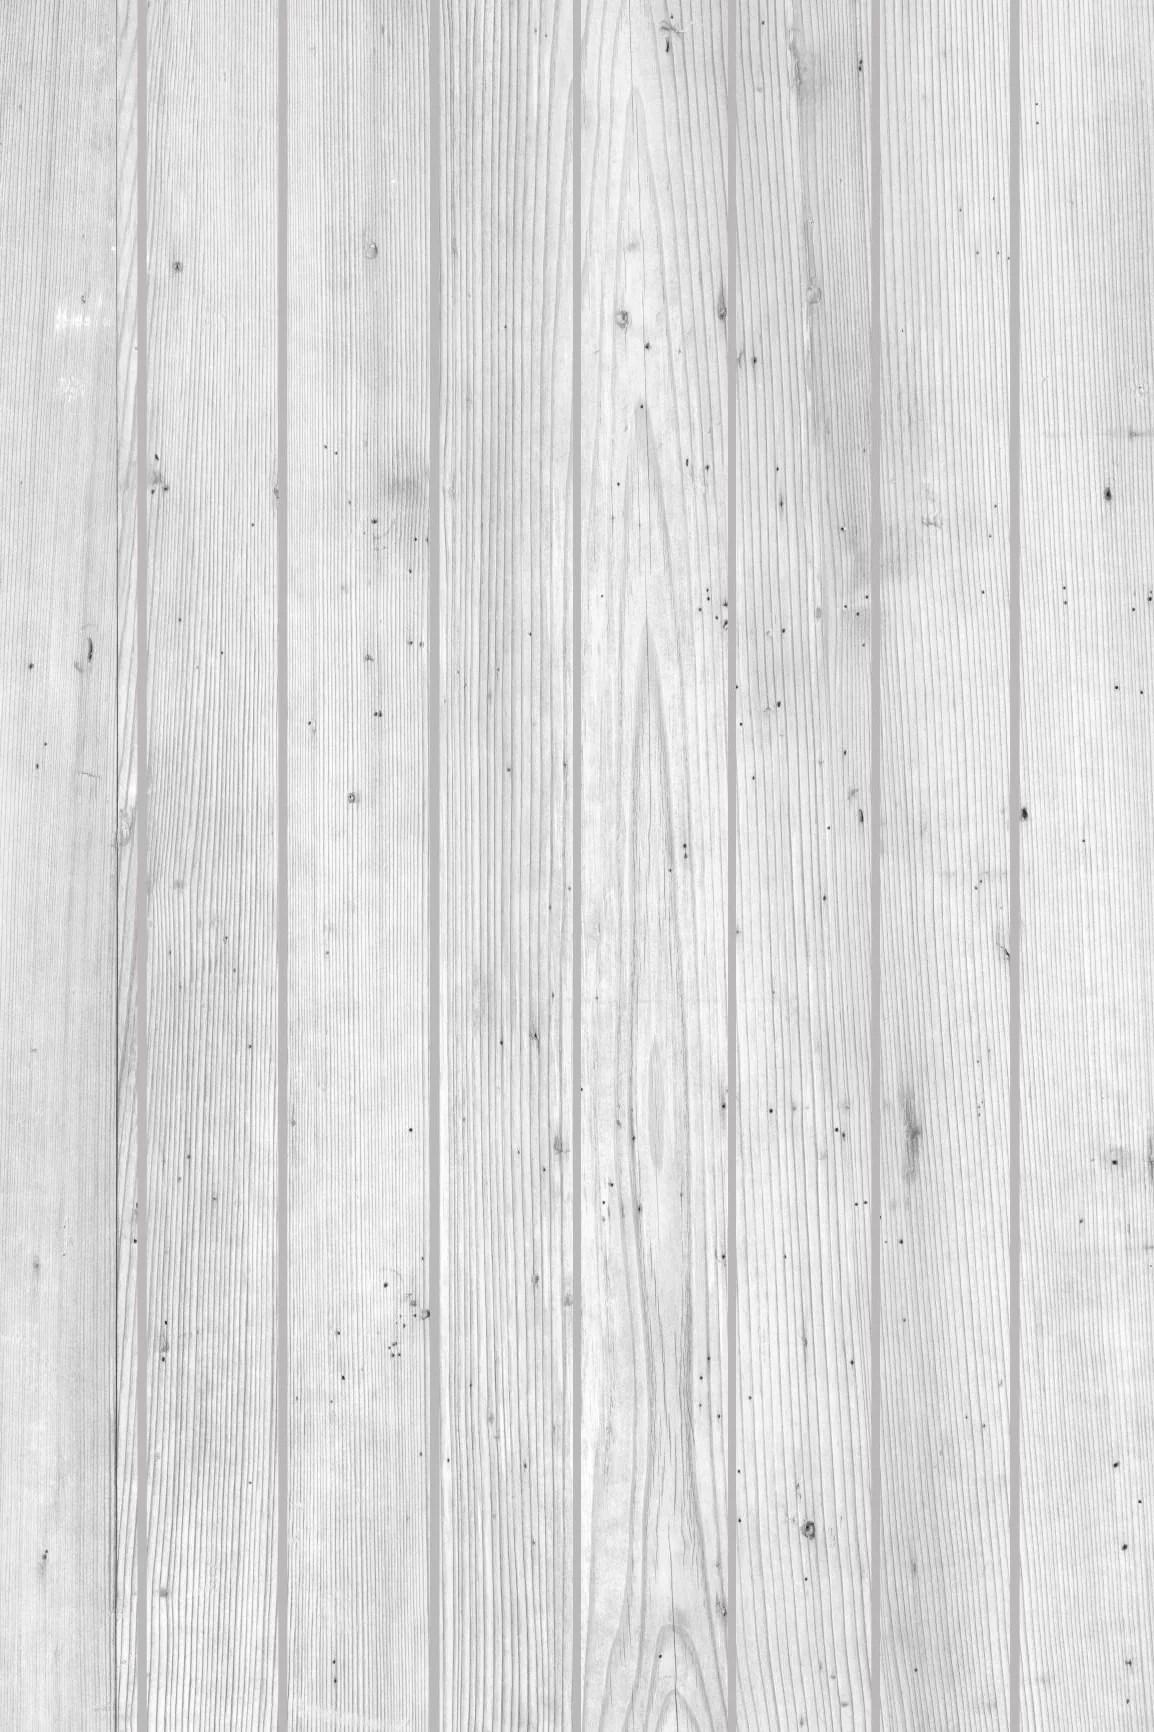 white fond photo effet bois blanc